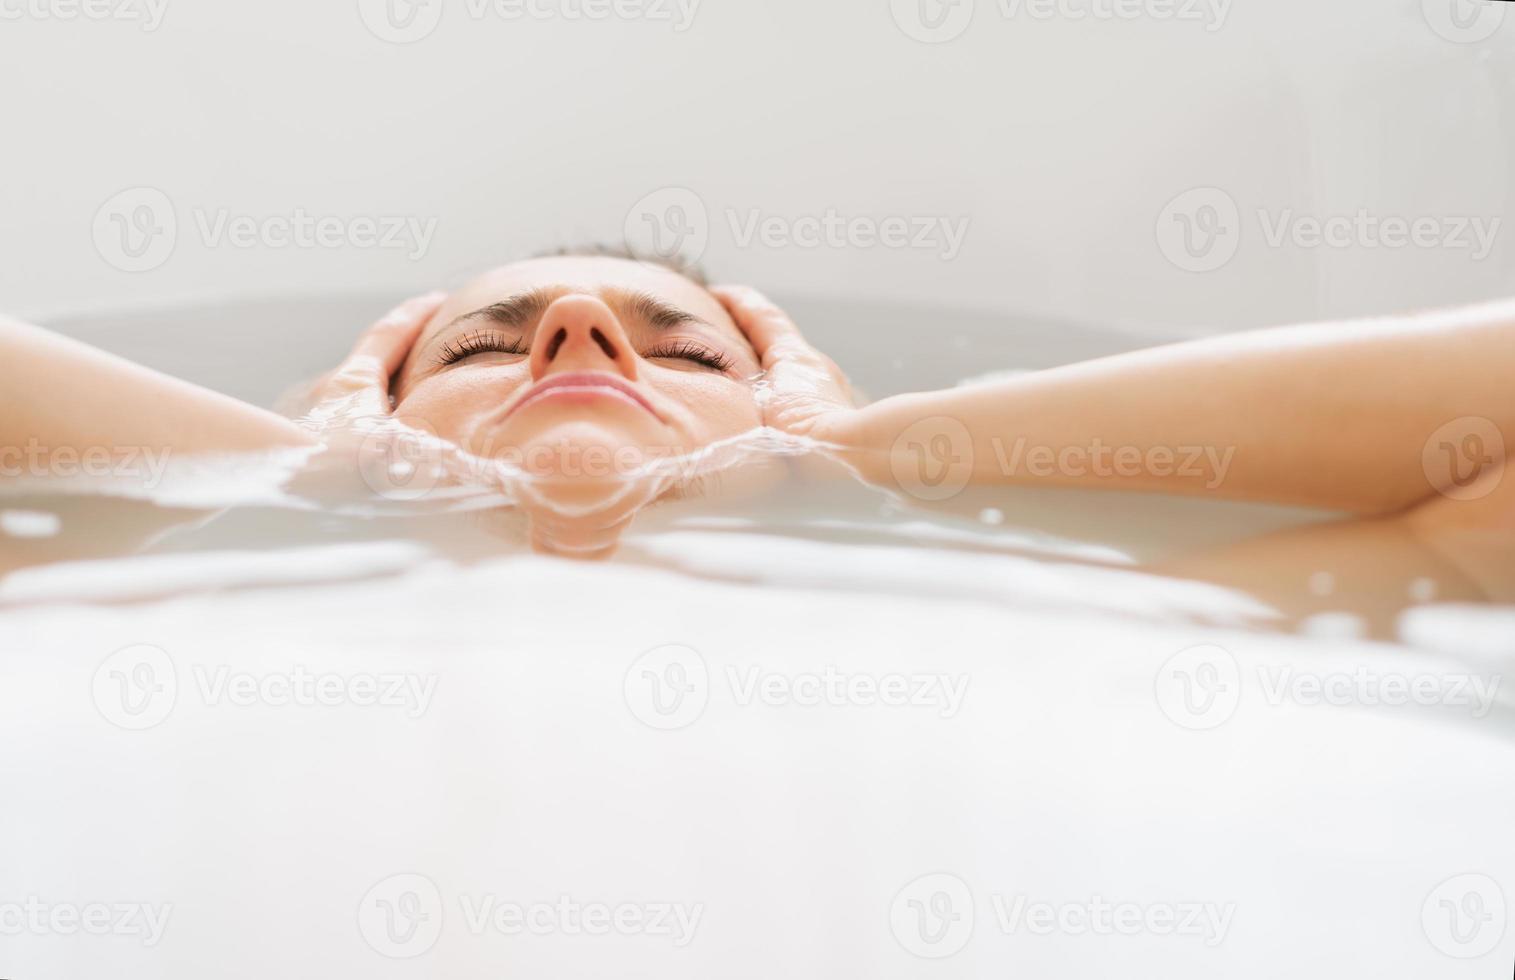 beklemtoonde jonge vrouw die in badkuip legt foto